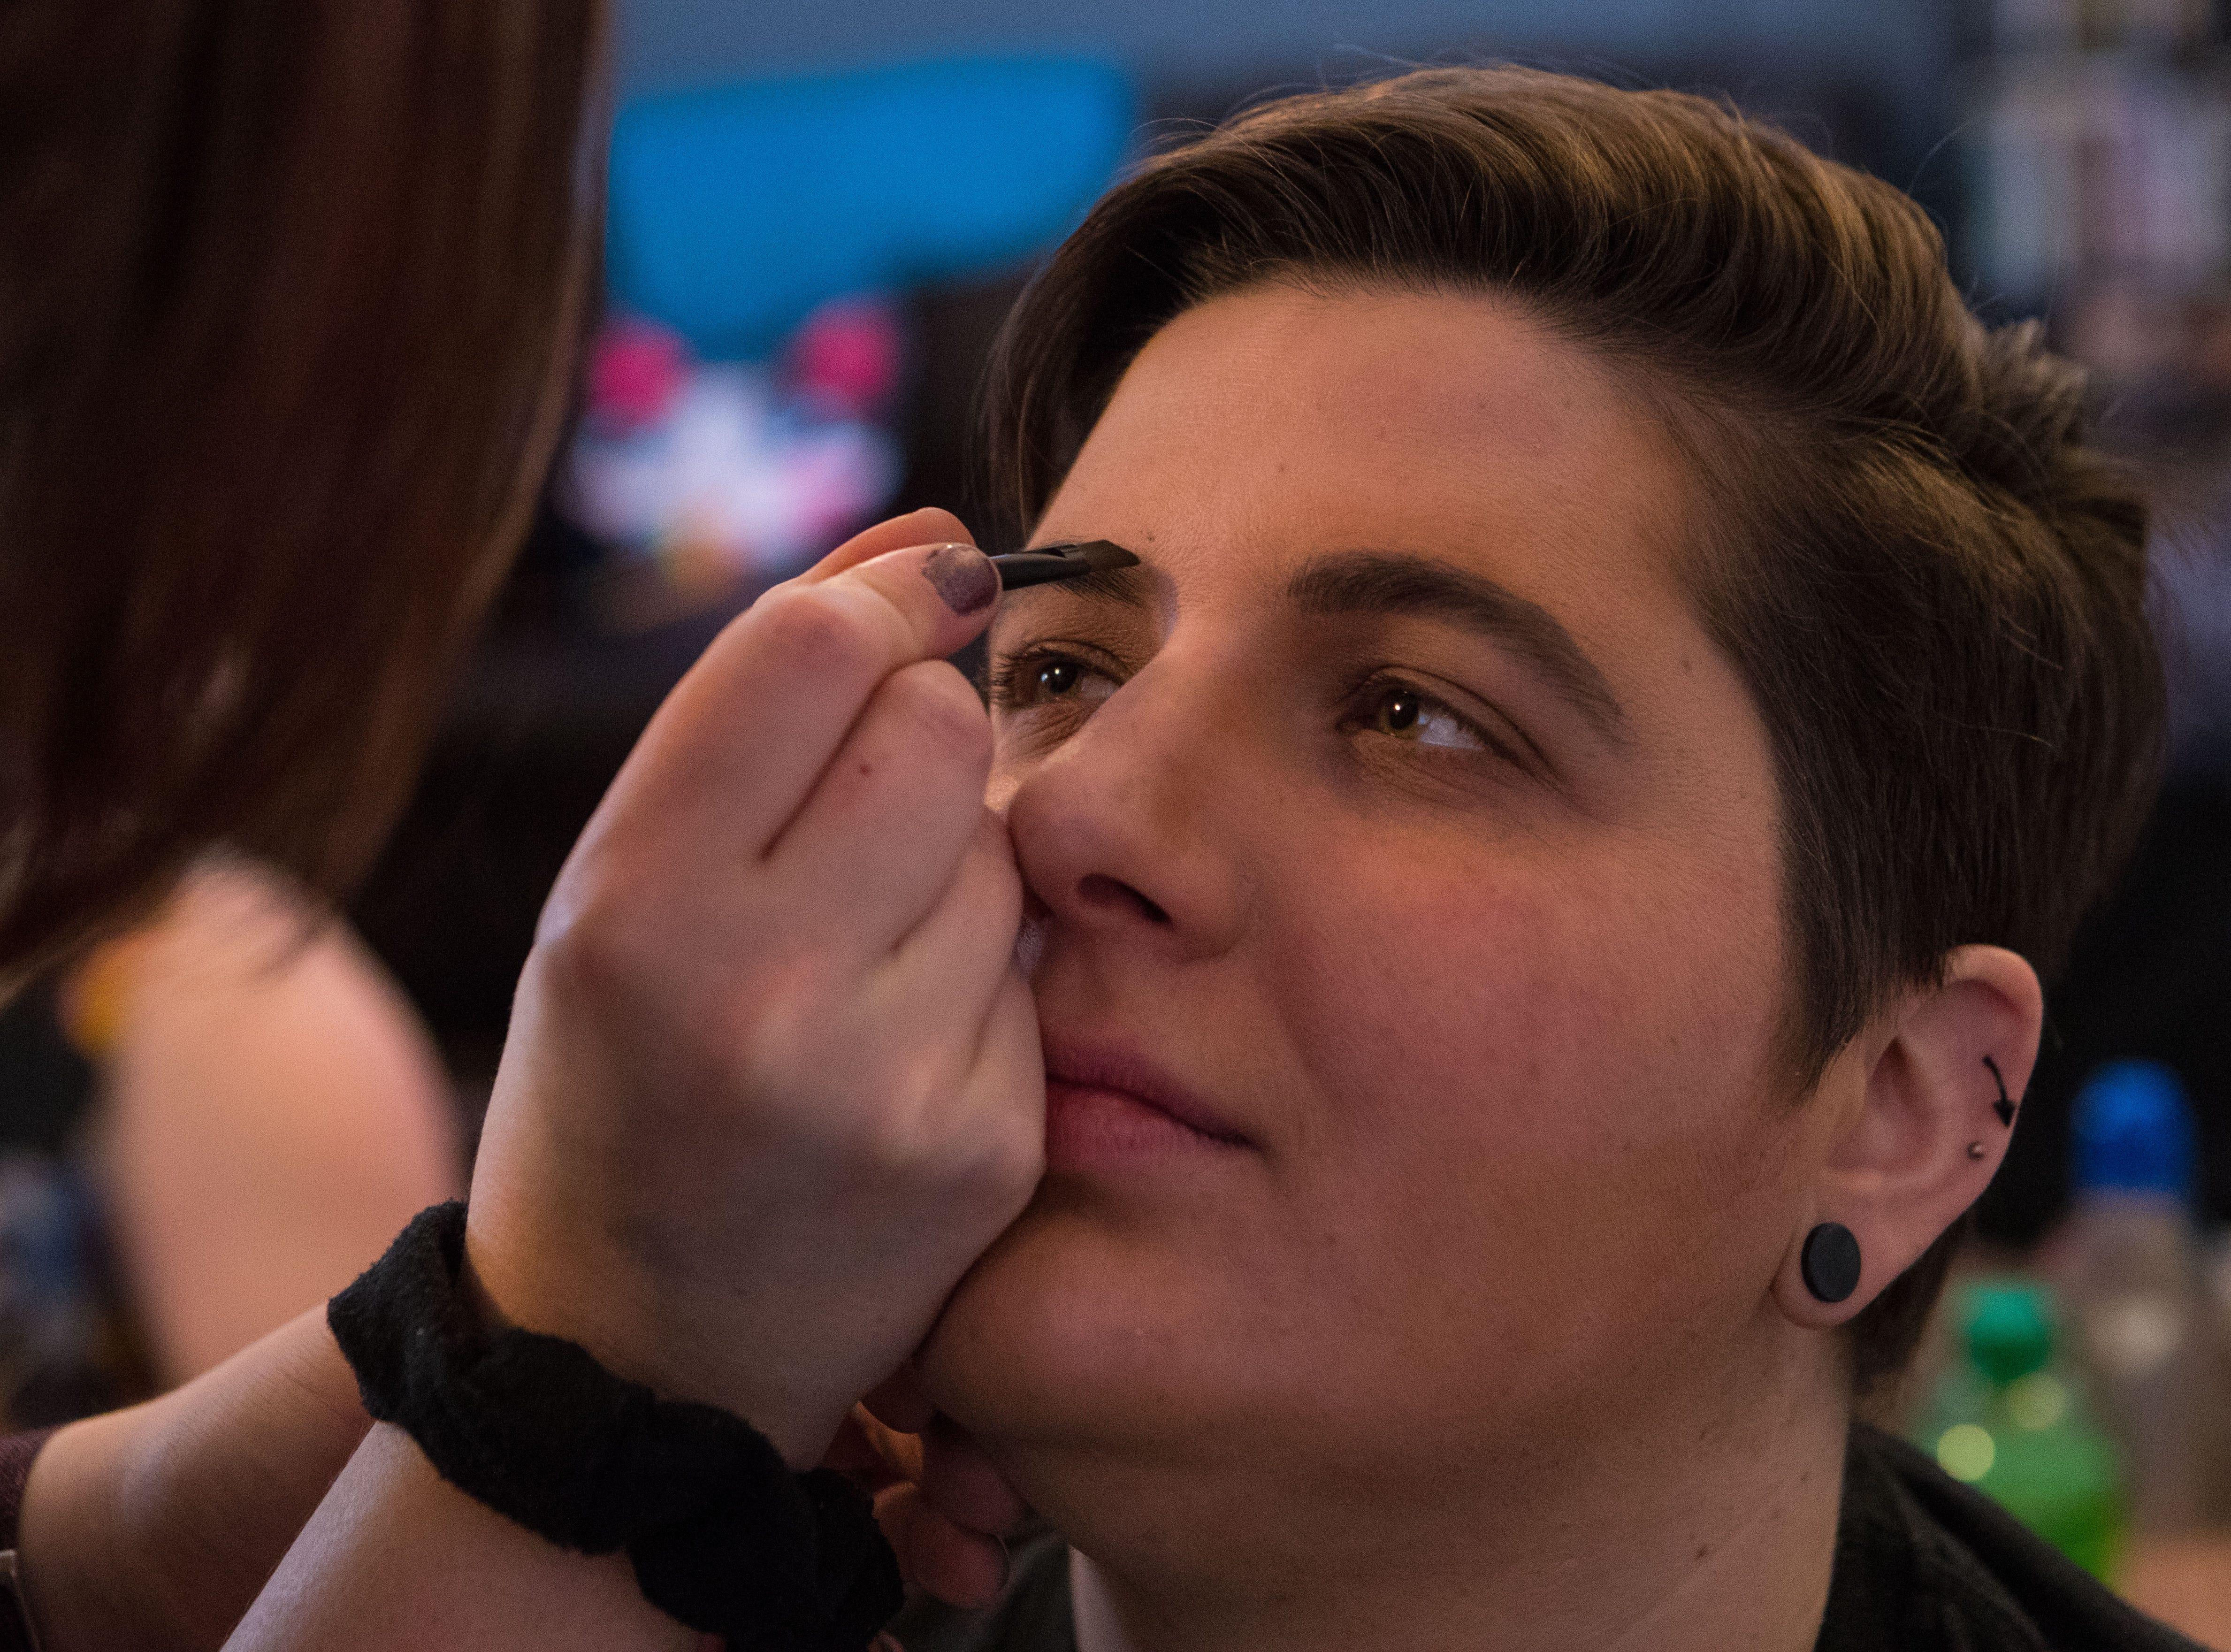 Christine Morgan does Katie Morgan's (drag name: Alex Feeliner) makeup during drag king rehearsal in Sioux Falls, S.D., Saturday, Jan. 26, 2019.